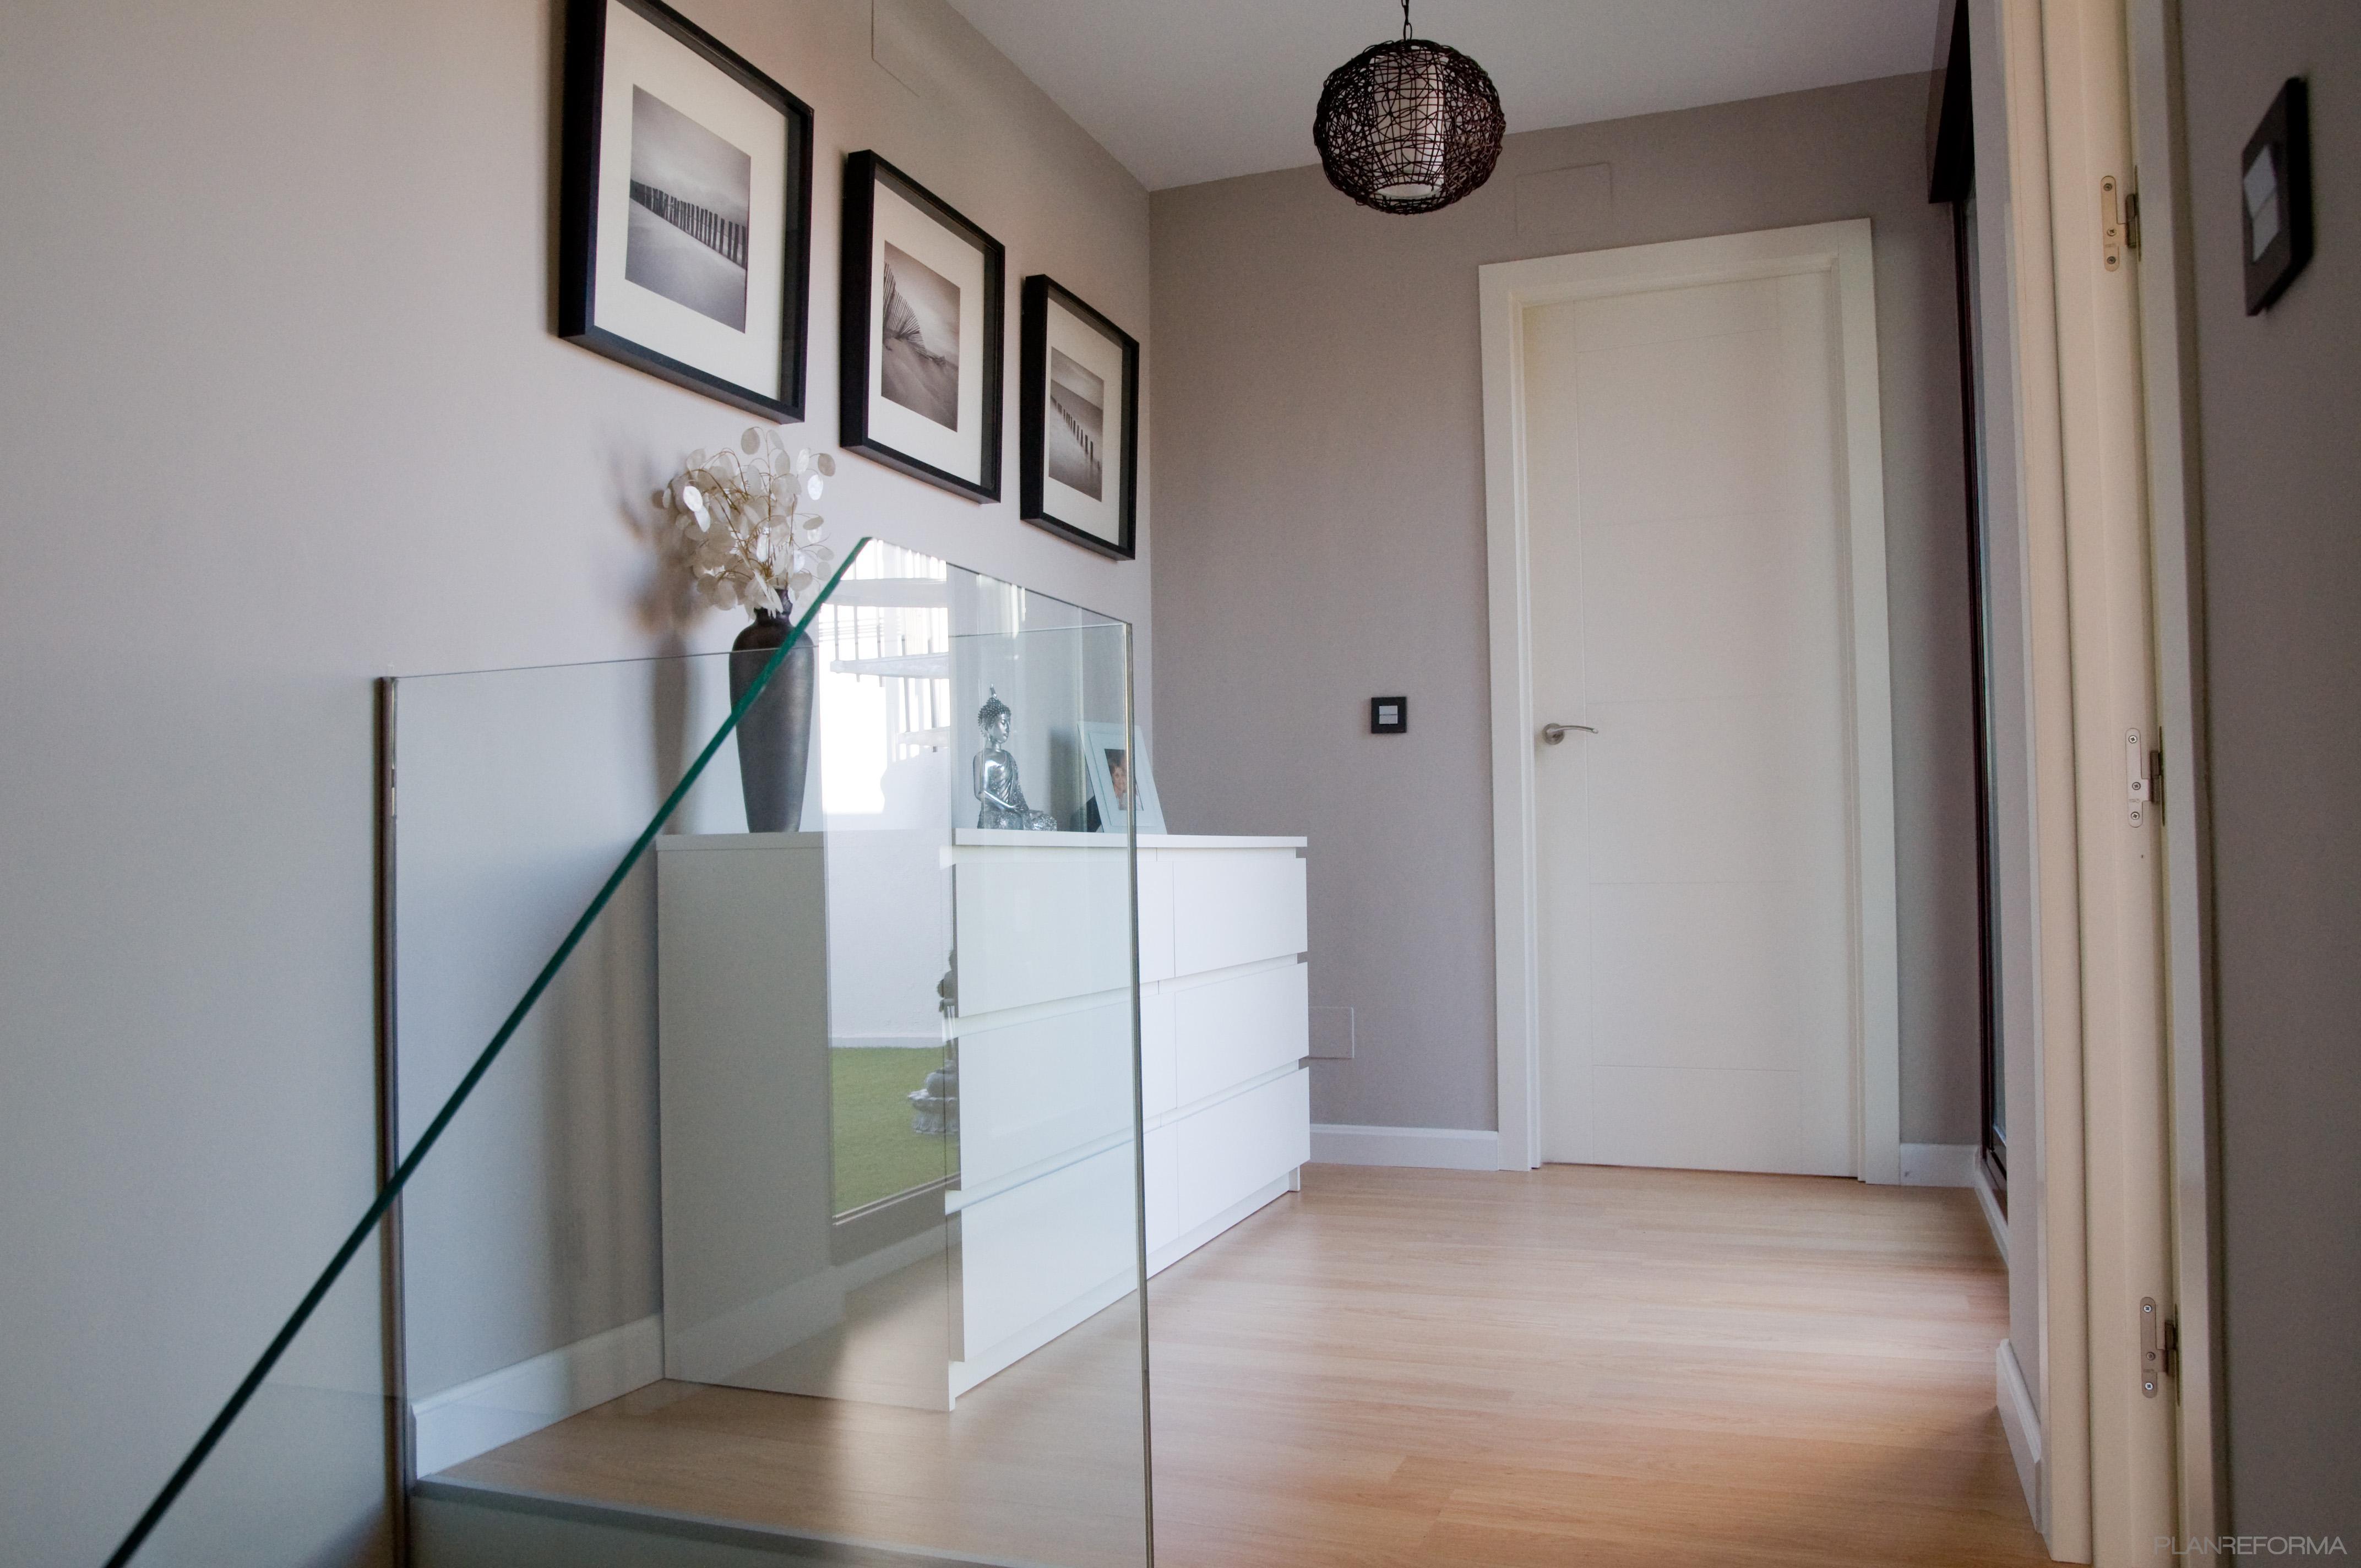 recibidor pasillo style contemporaneo color beige blanco